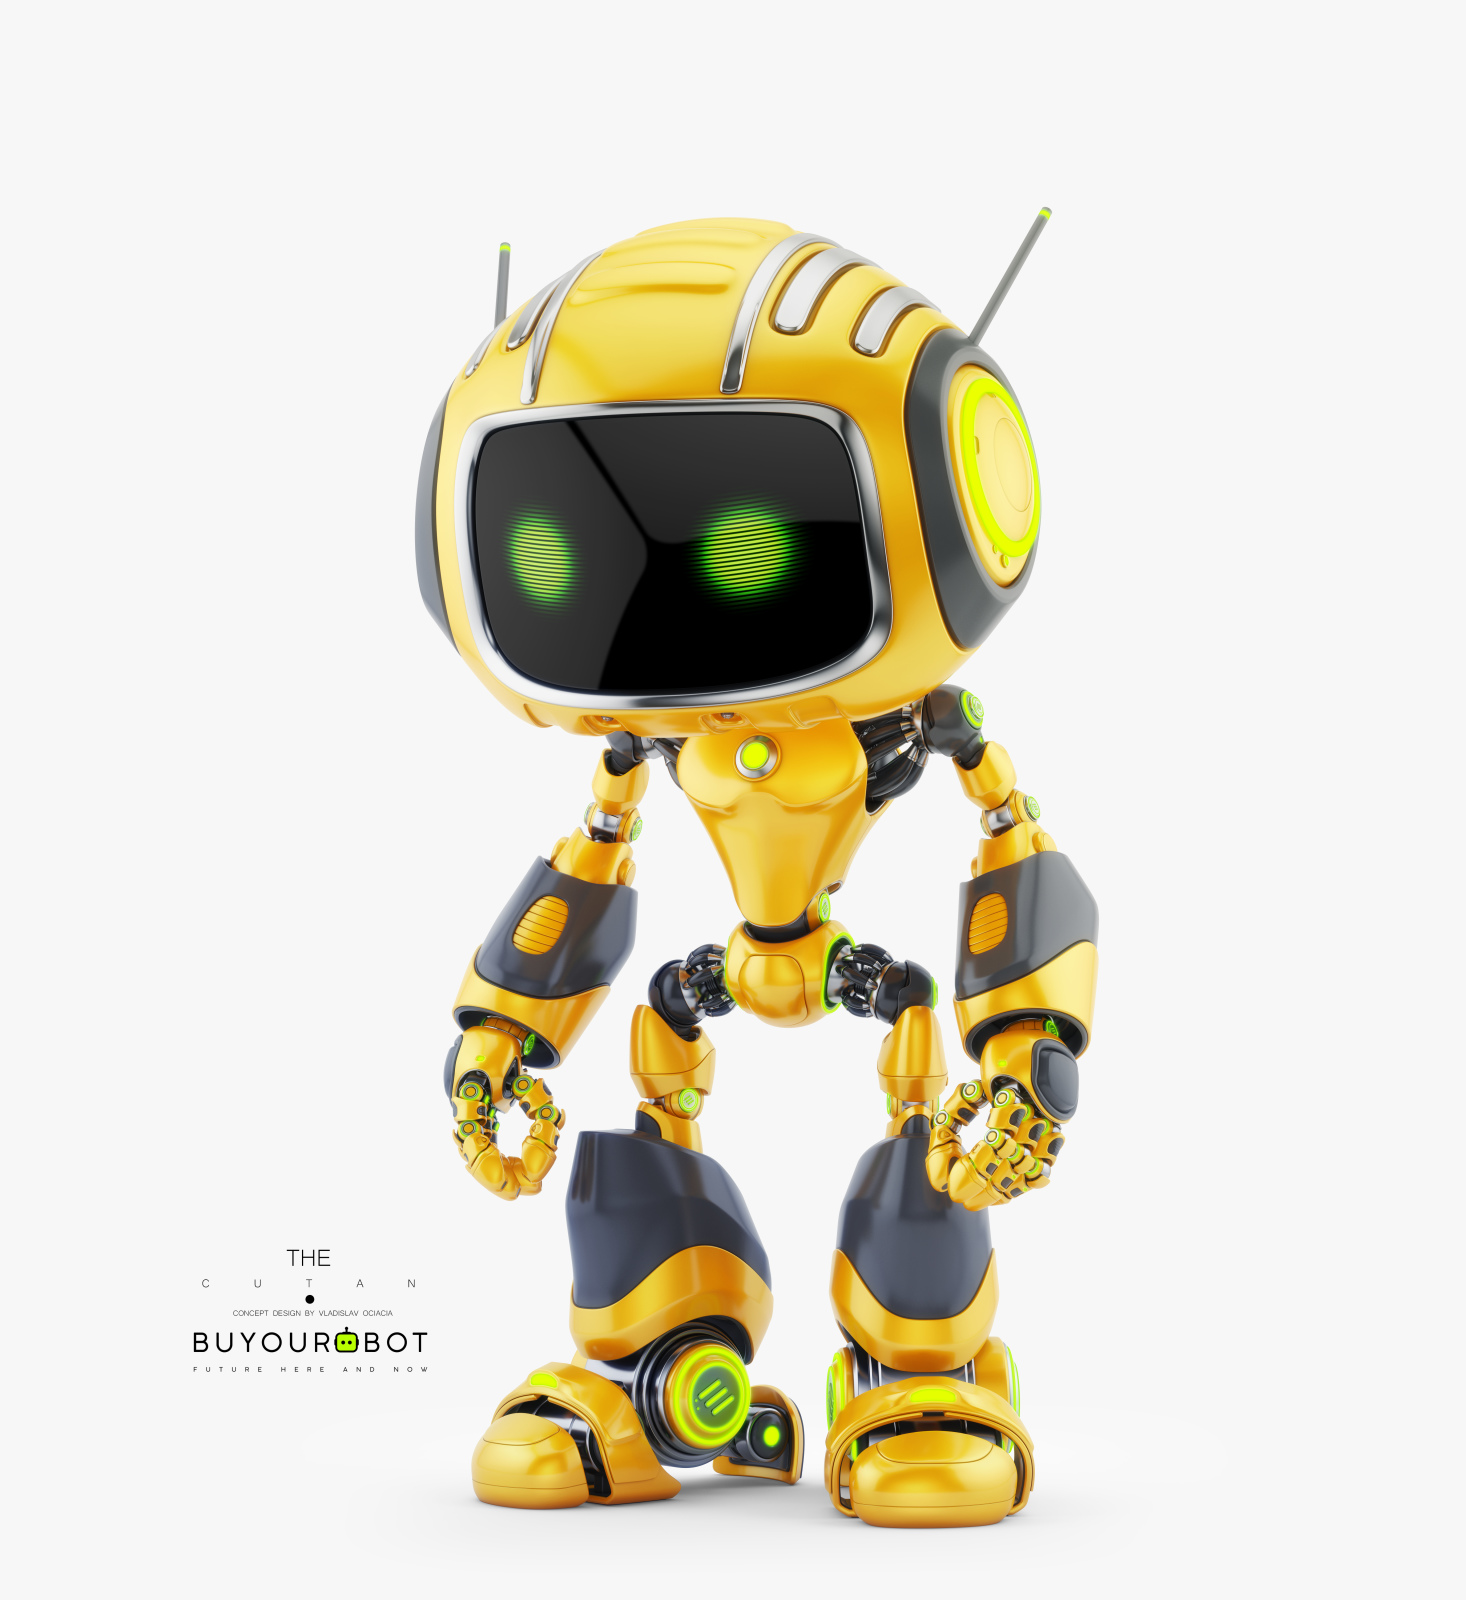 CUTE ALIEN ROBOT V 1